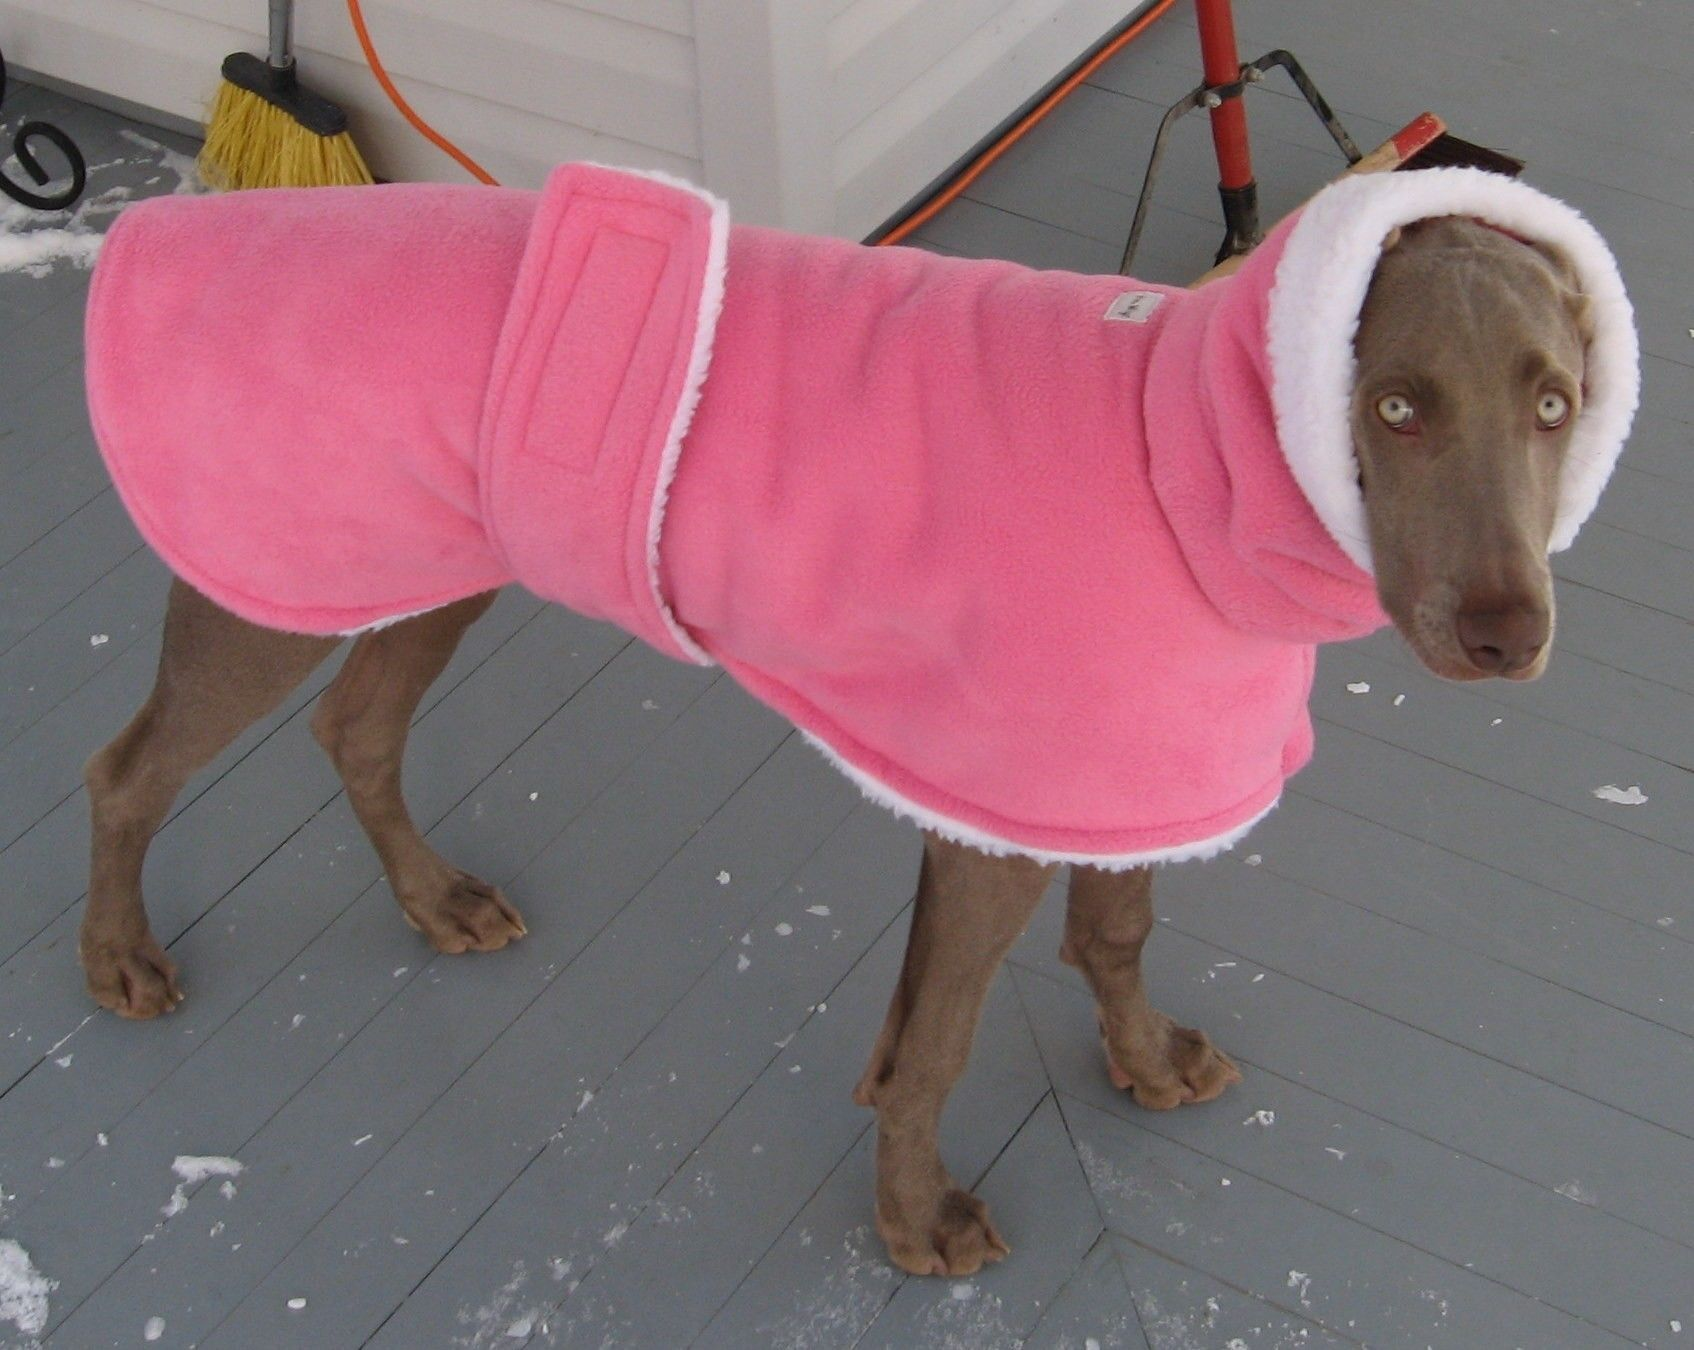 NEW Fabrics....Warmwags Medium or Large Fleece and Sherpa